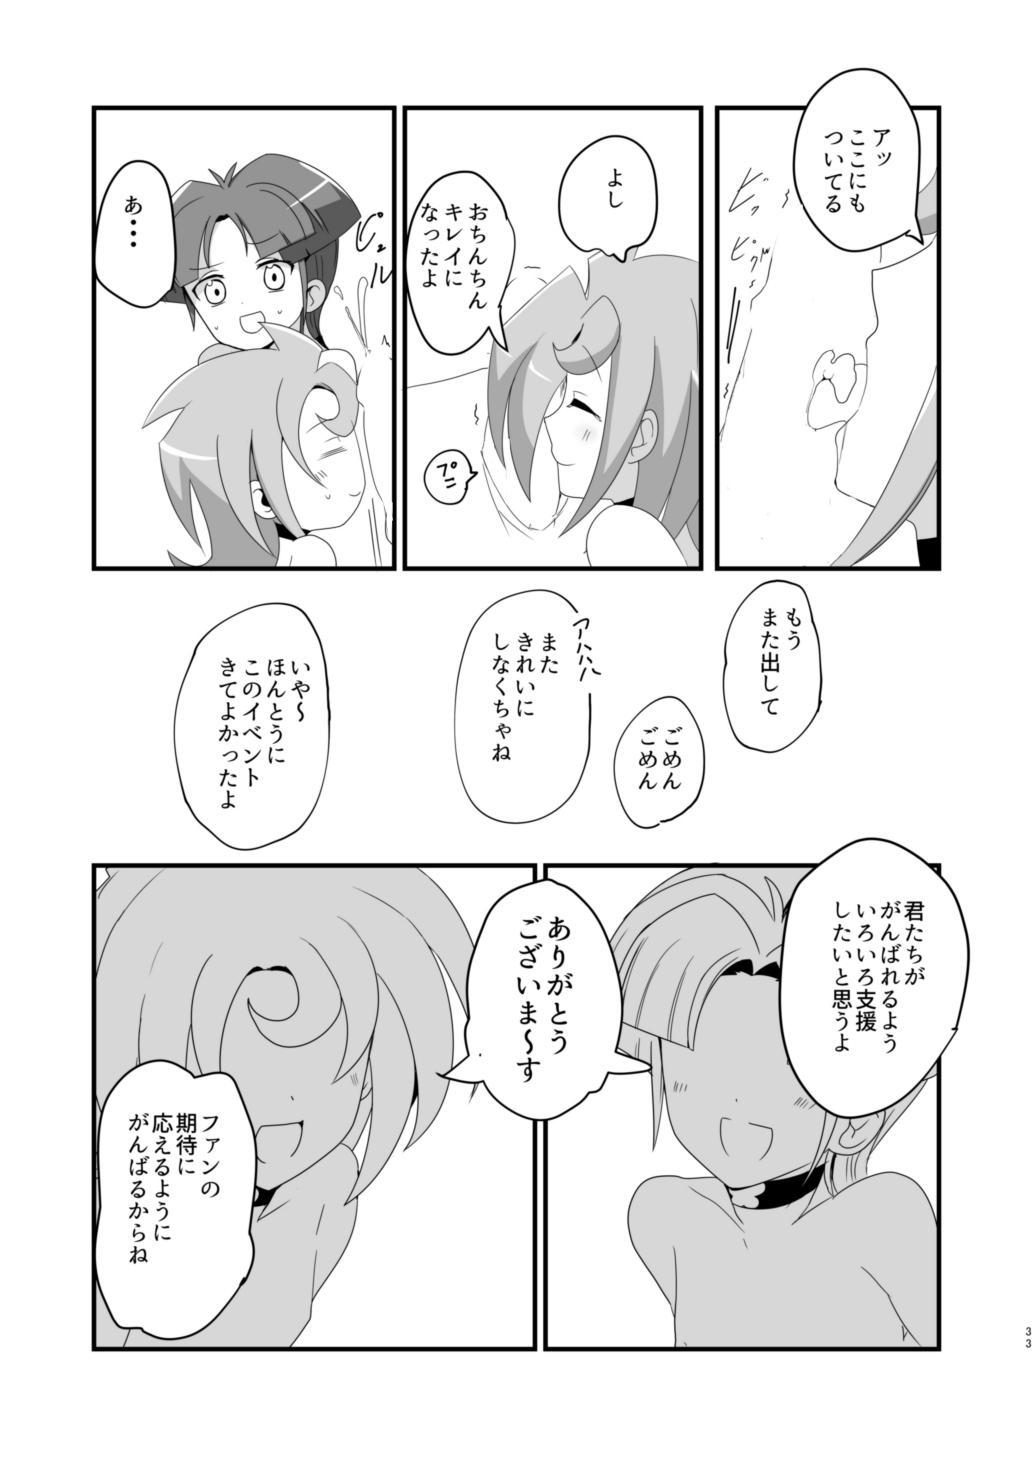 LunaAm O♂n♂n Akushuukai 31